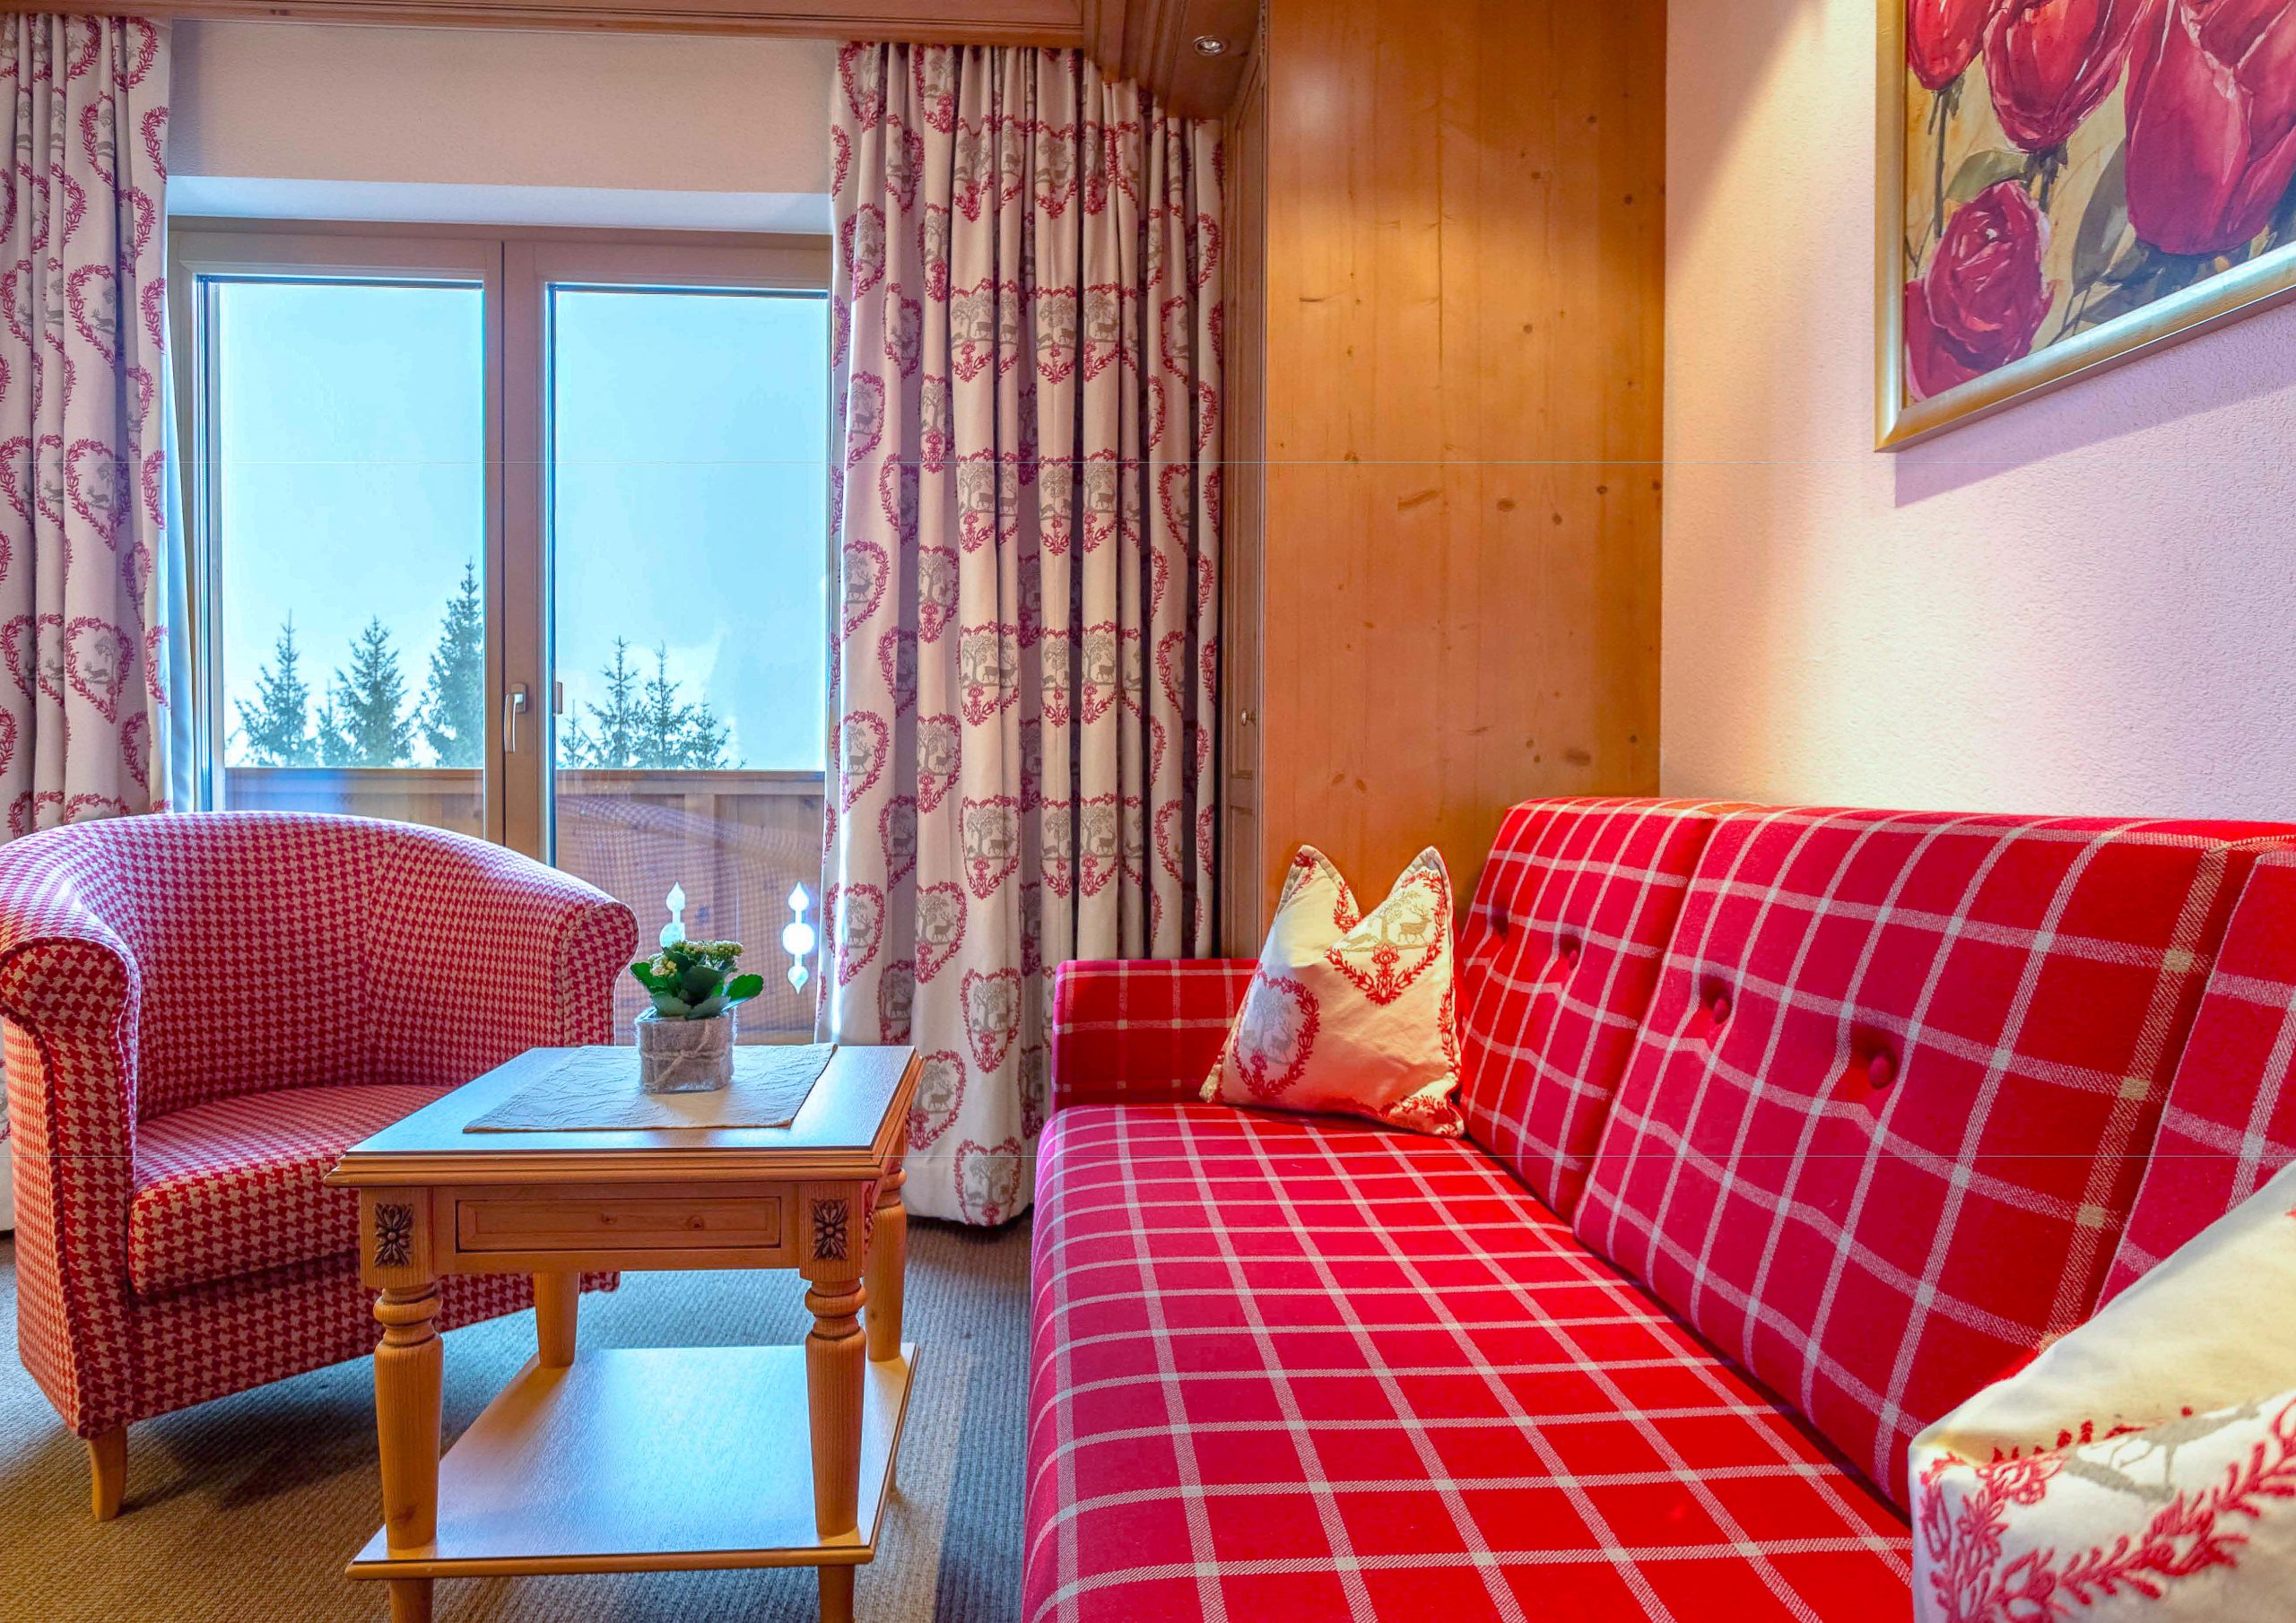 Hotel Gletscherblick, St. Anton am Arlberg